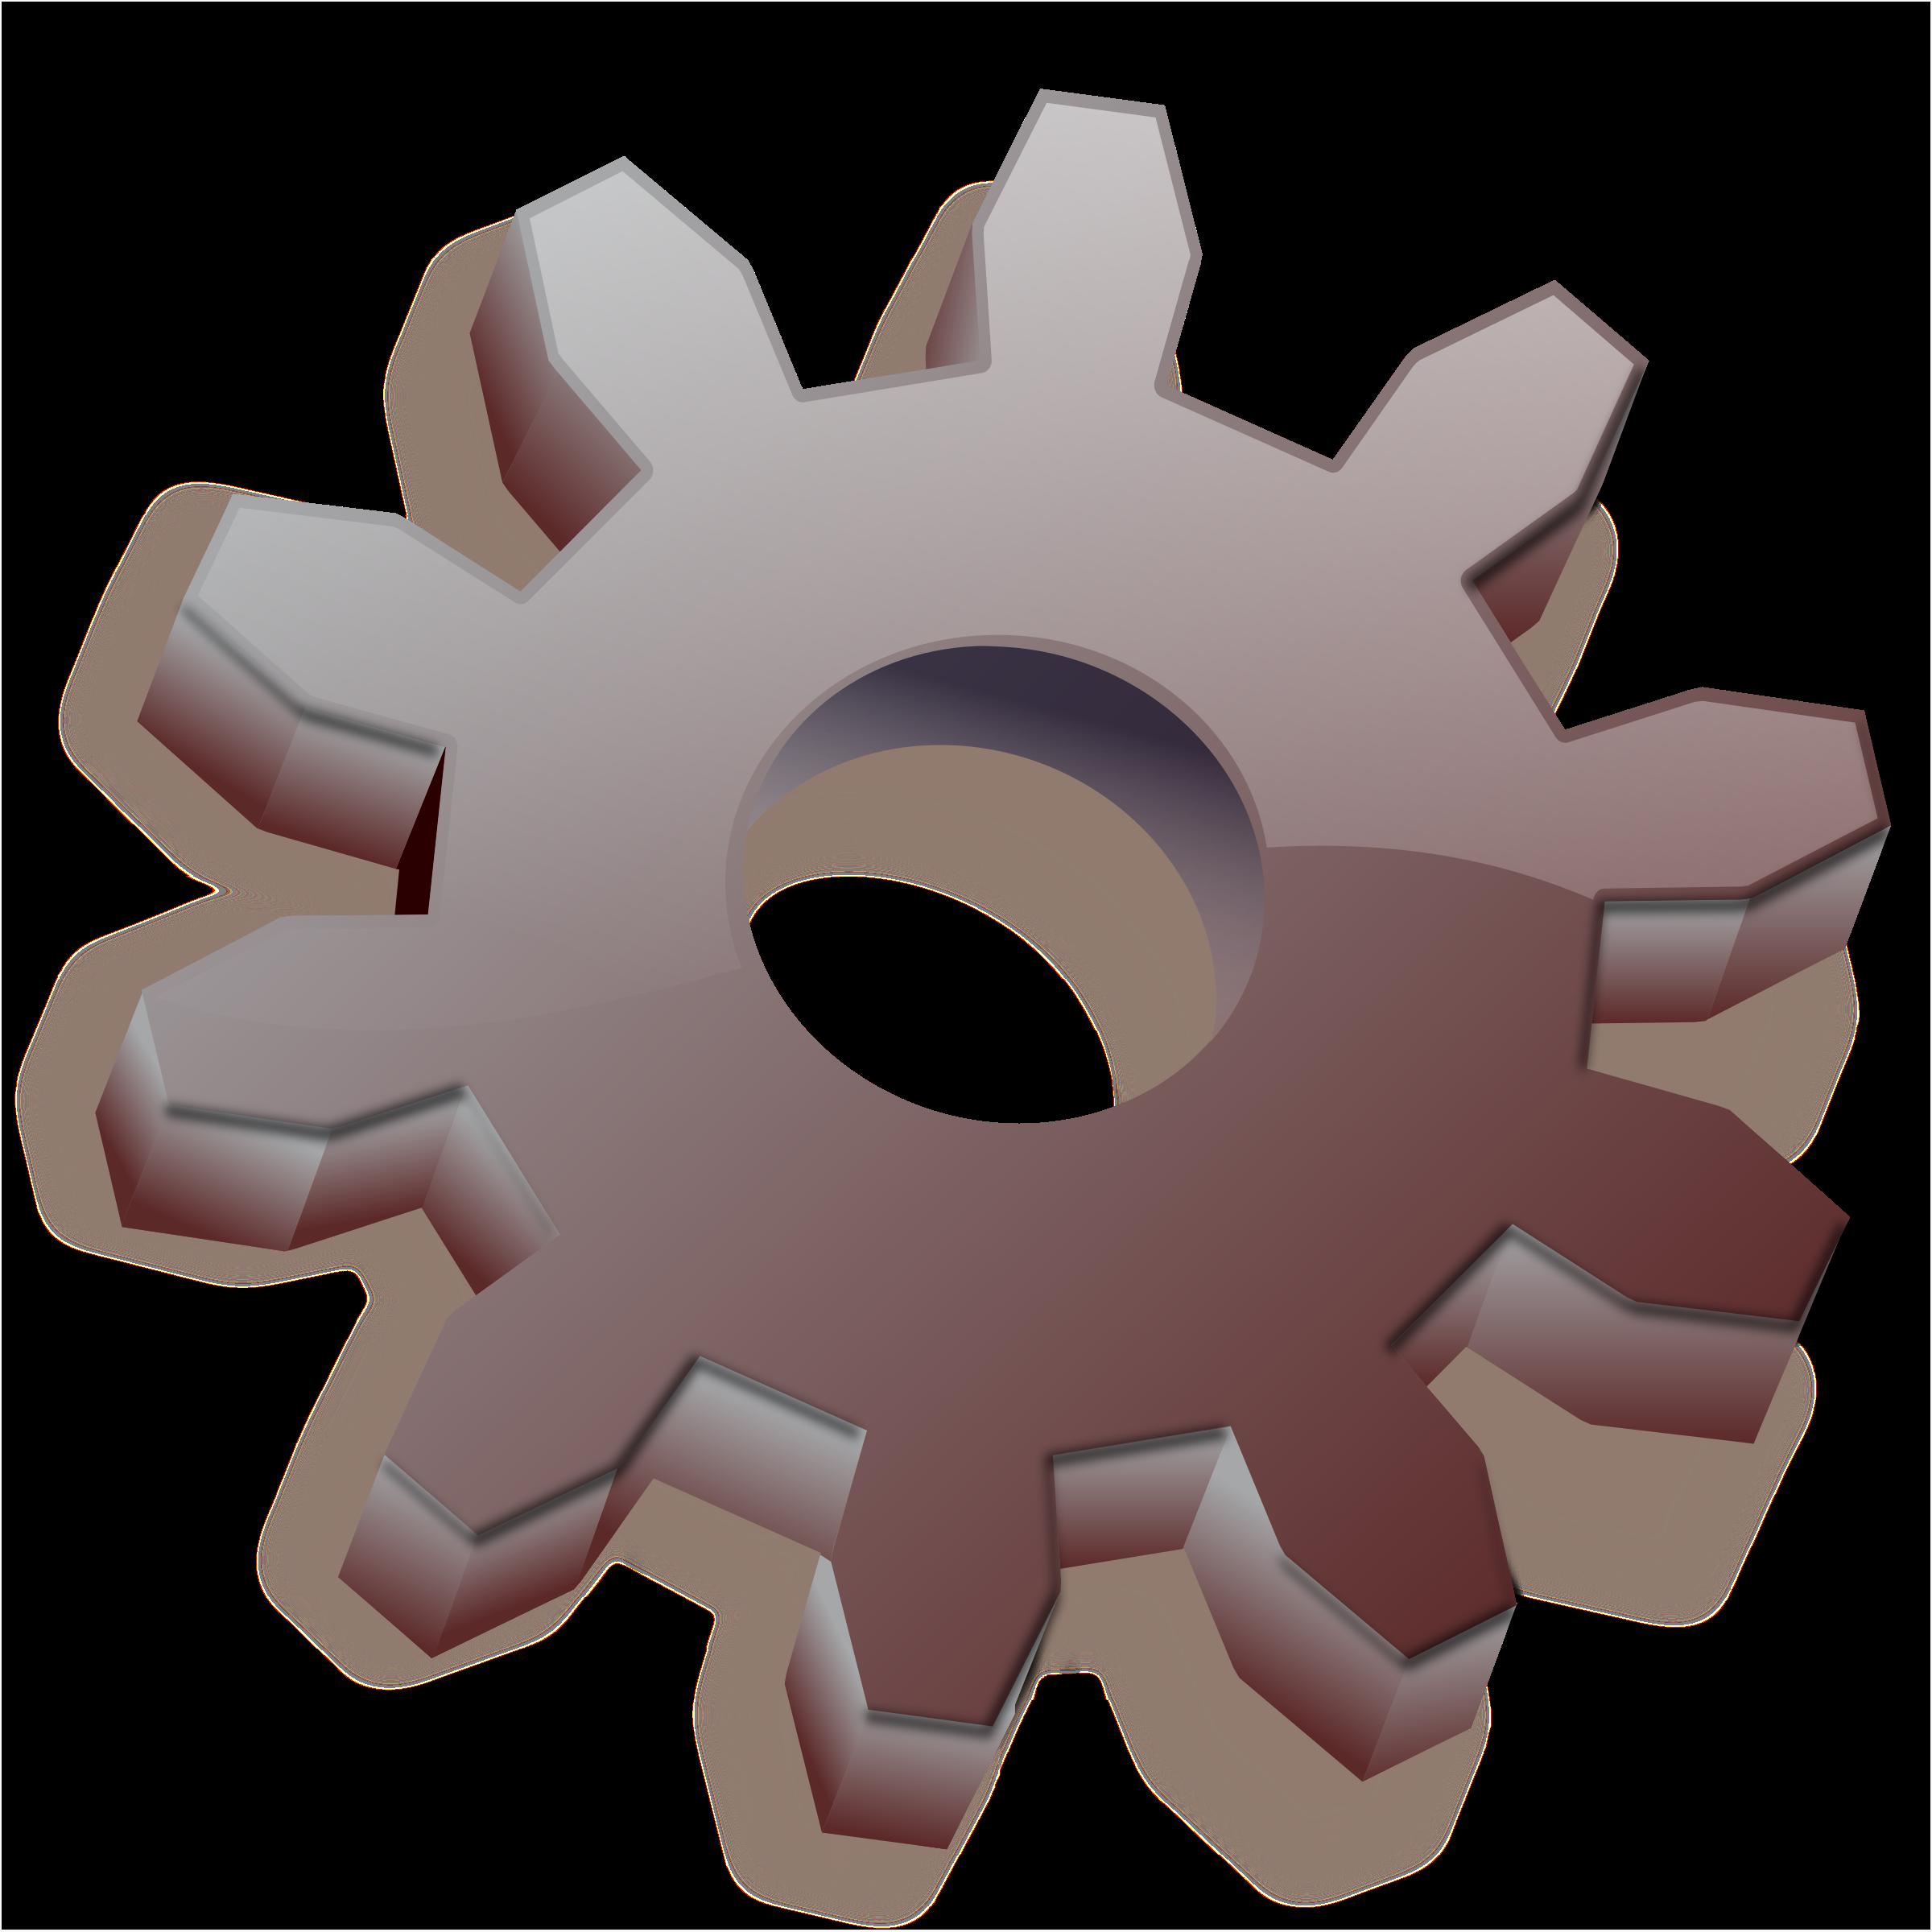 Gear icon. Gears clipart grey